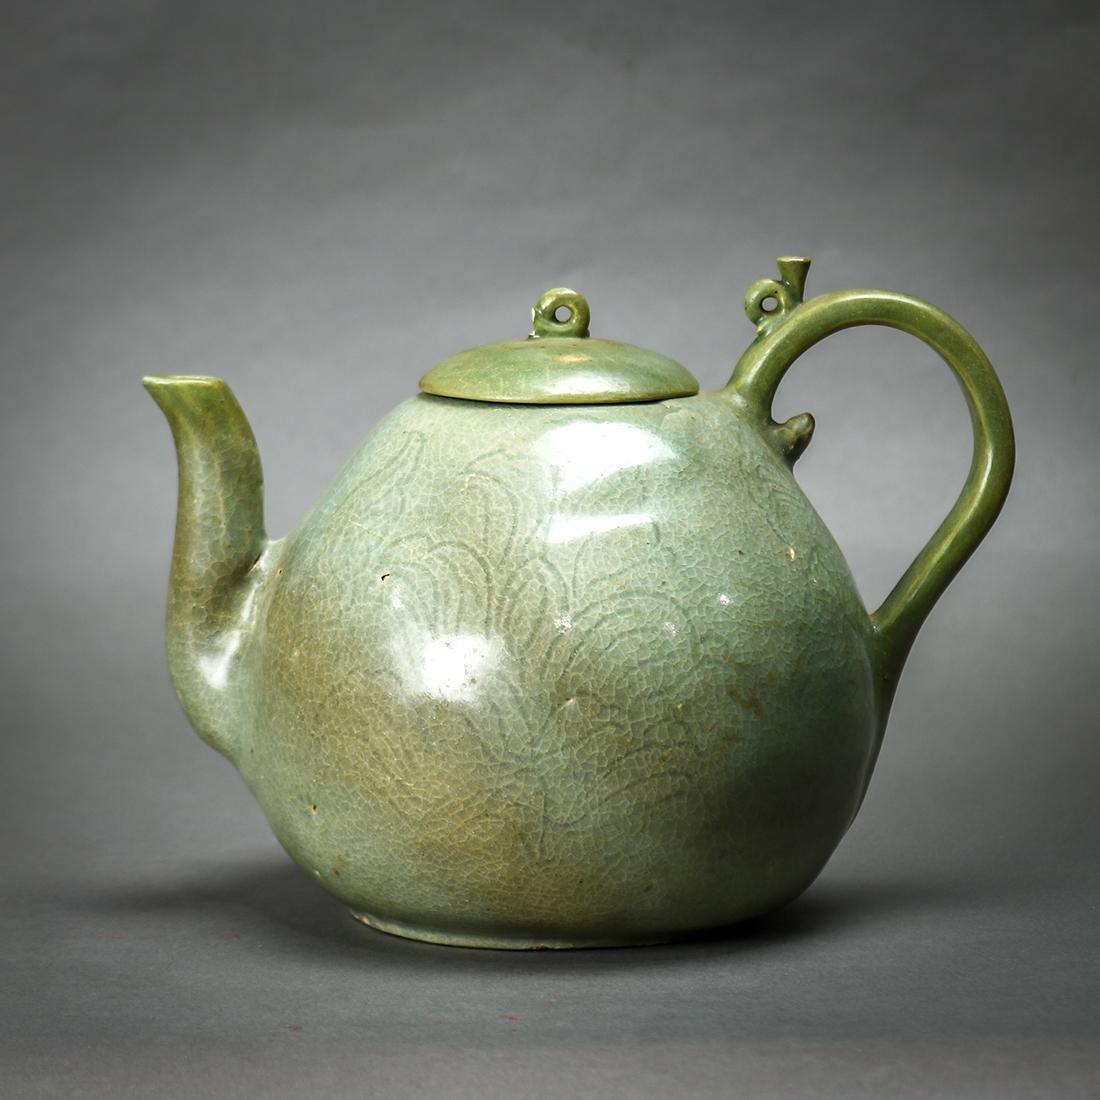 Korean Celadon Ceramic Teapot